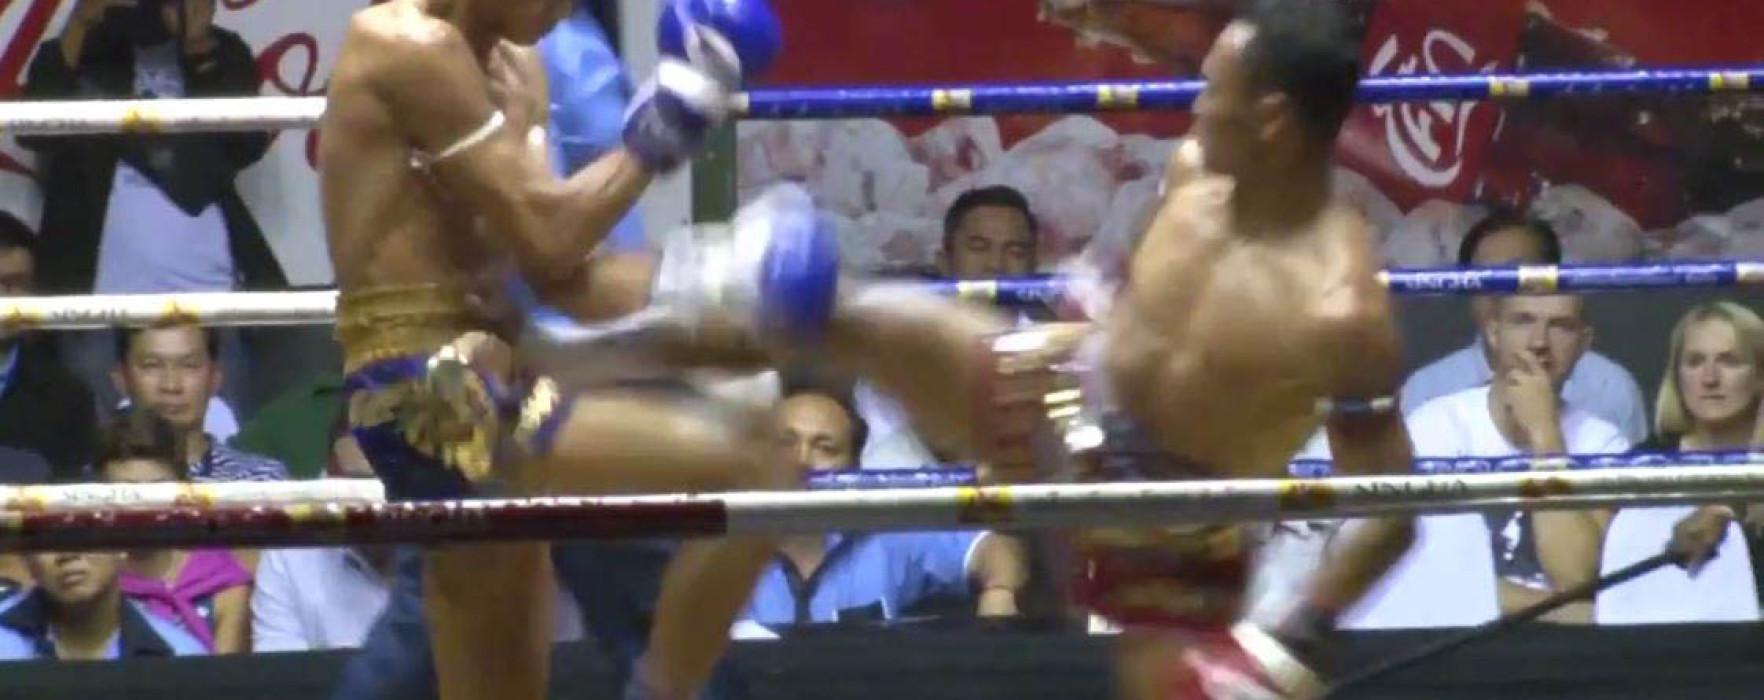 Video: Saenchai PkMuayThai vs Petchmorrakot Wor Sangprapai – Rajadamnern Stadium Bangkok – 9th October 2014